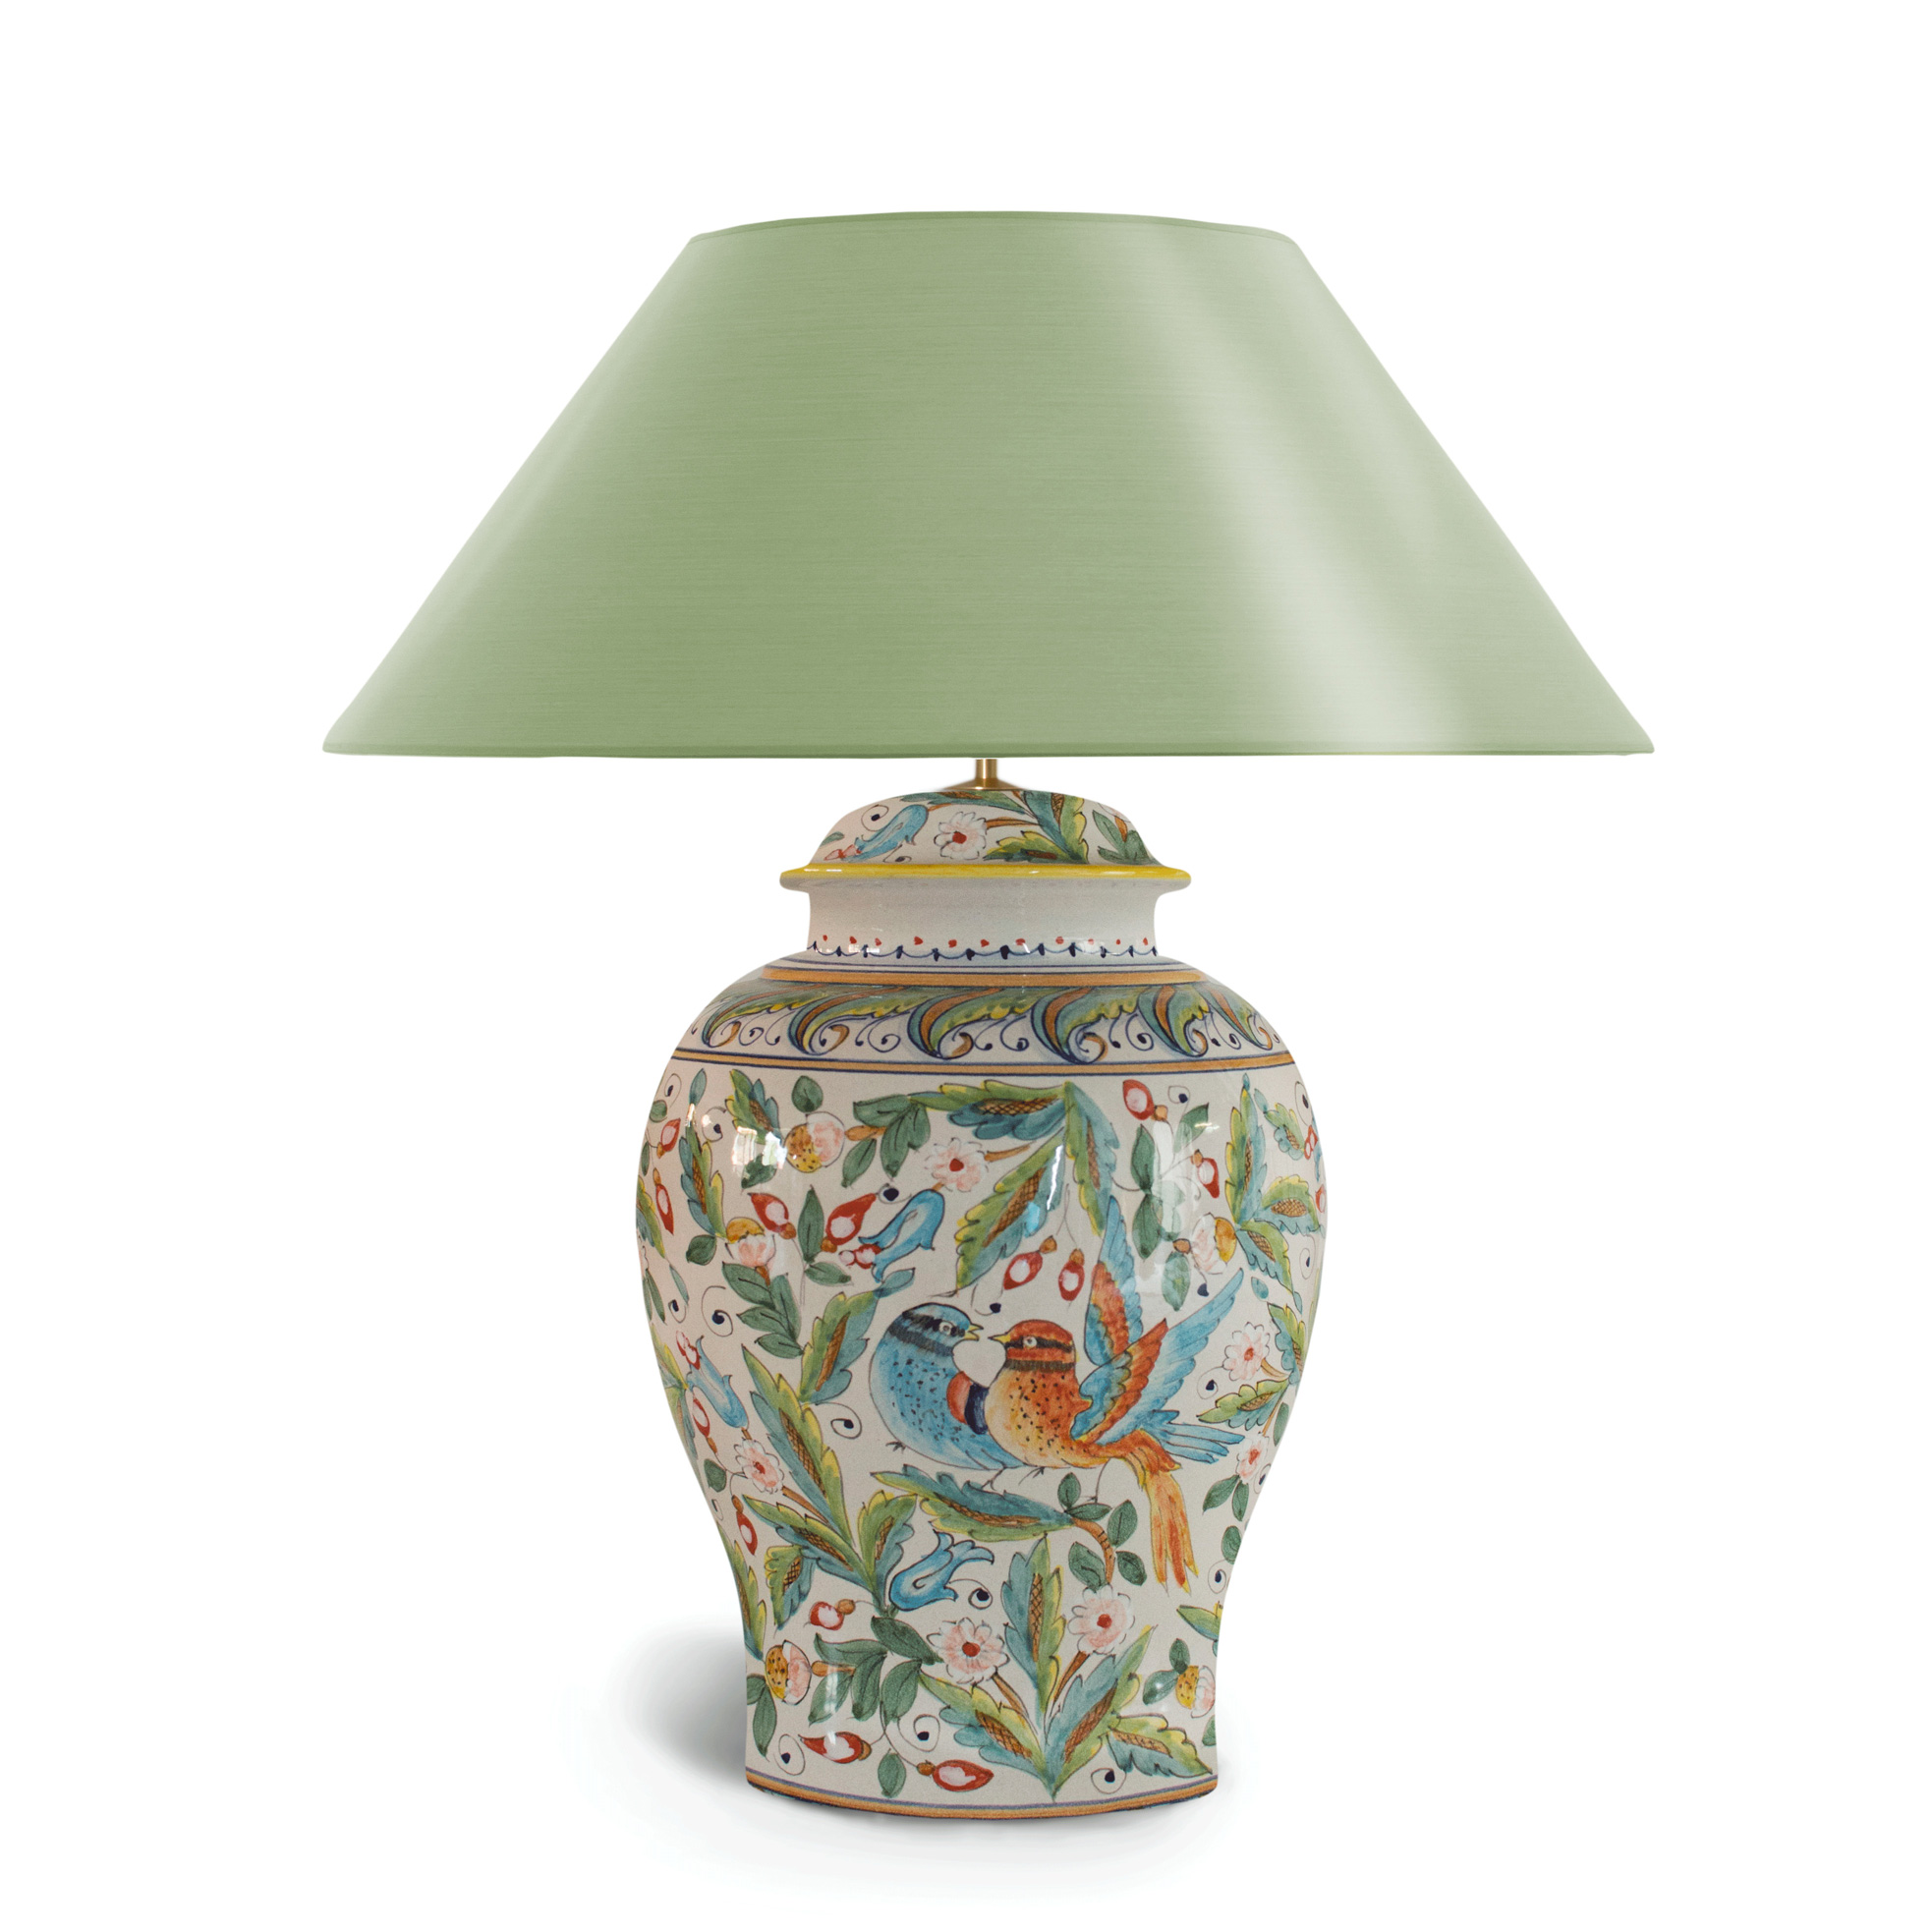 italienische tischlampe primavera selbst gestalten ambiarte. Black Bedroom Furniture Sets. Home Design Ideas